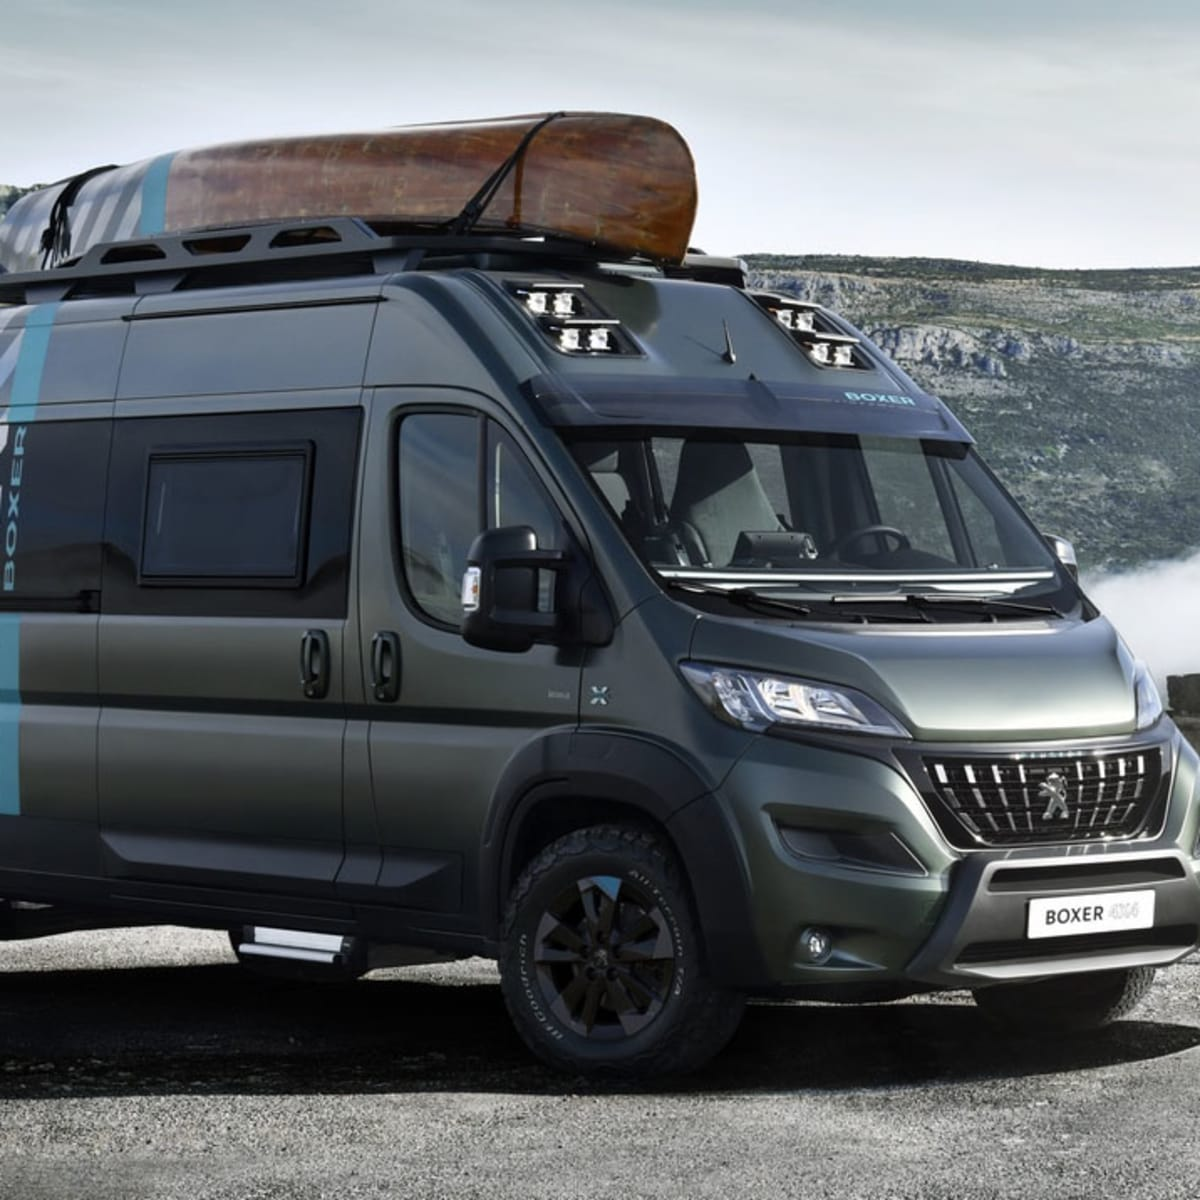 Peugeot Boxer 8x8 Concept revealed  CarAdvice